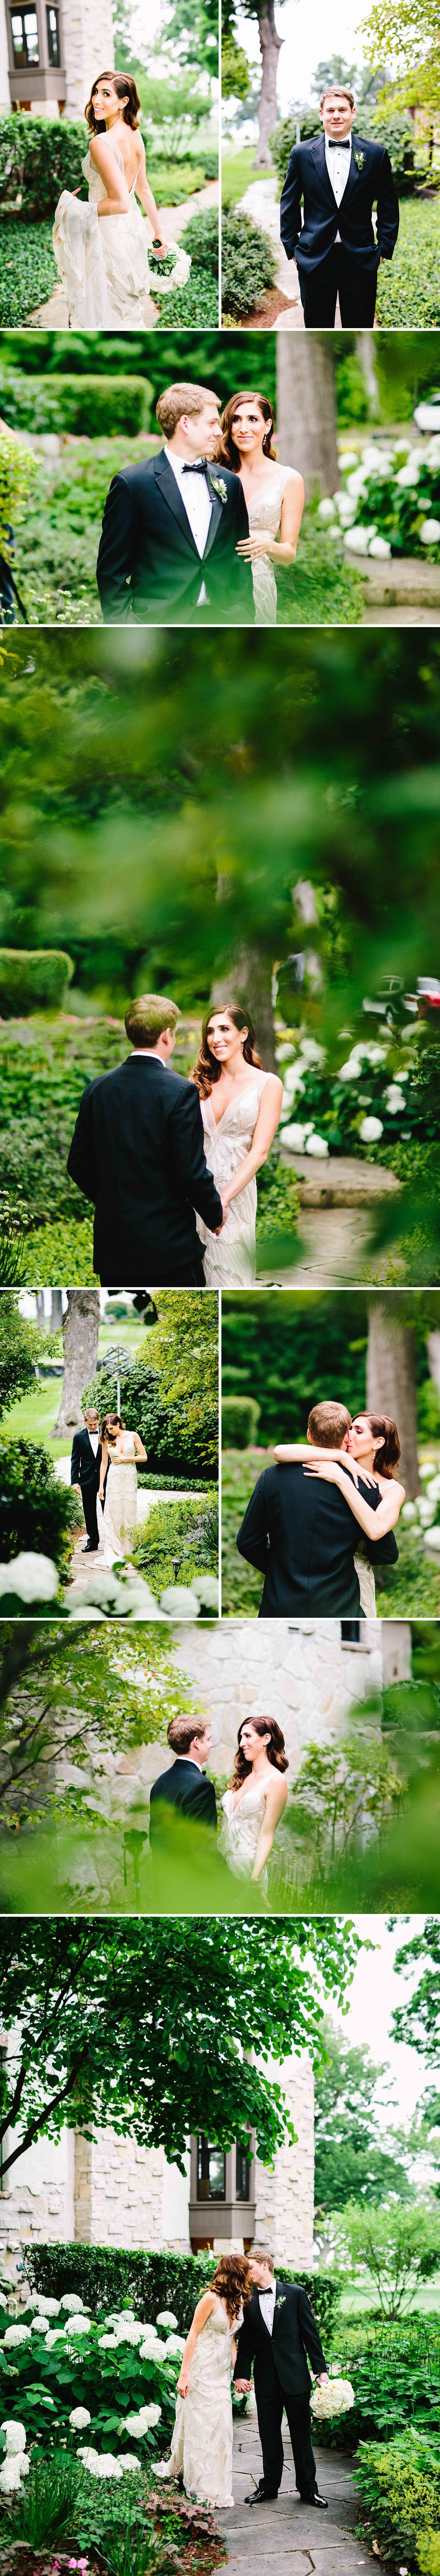 chicago-fine-art-wedding-photography-owens1